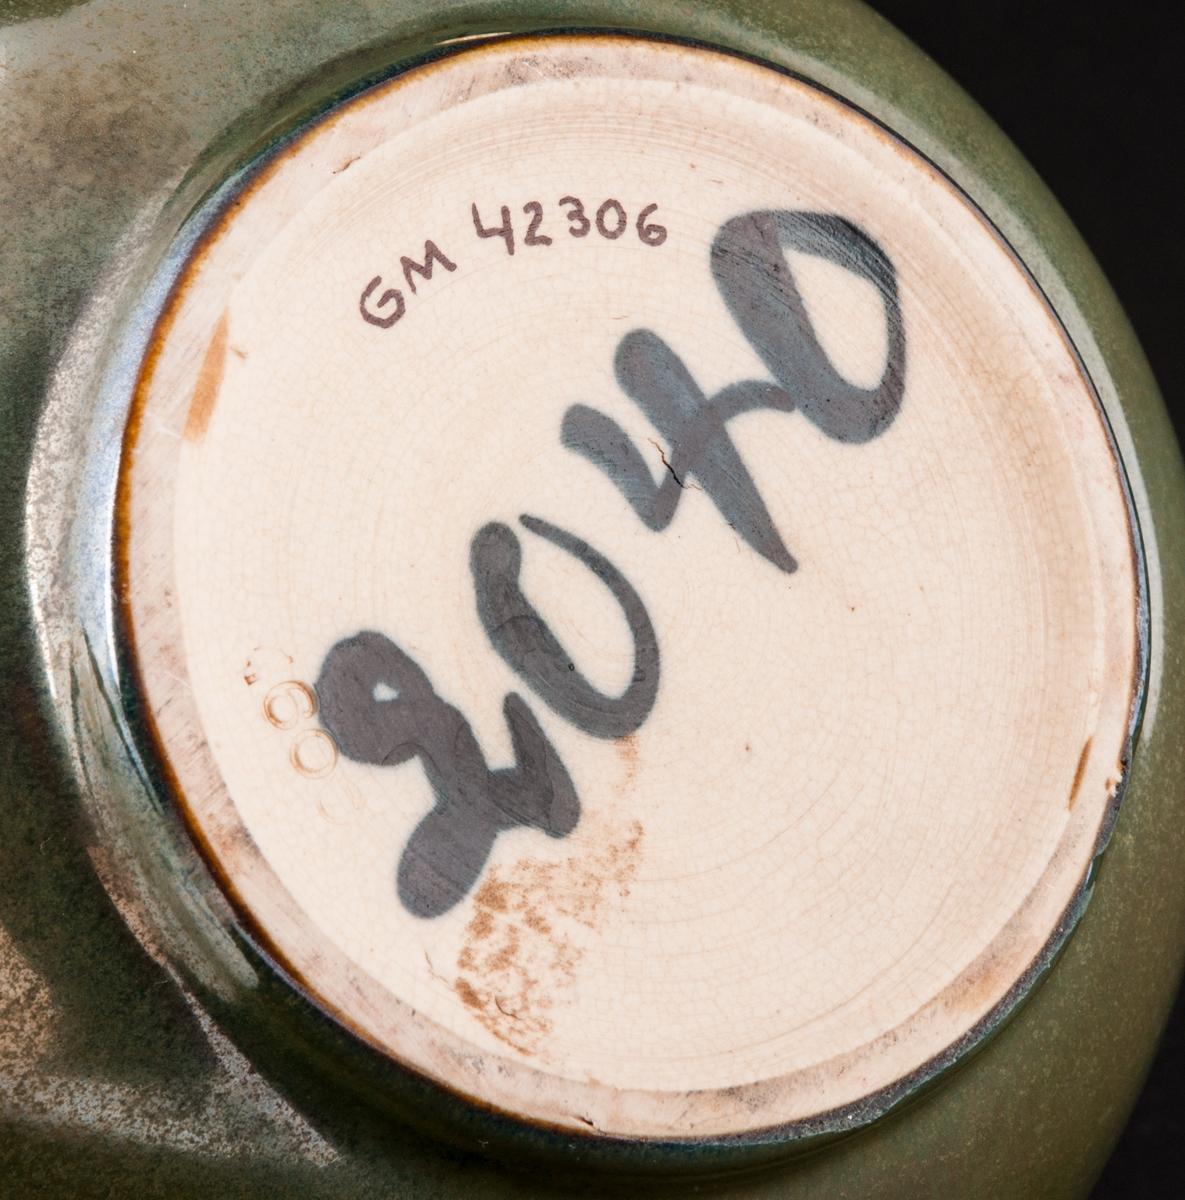 Skål, i grönskimrande glasyr, målar i botten: 2040, präglat 1600.